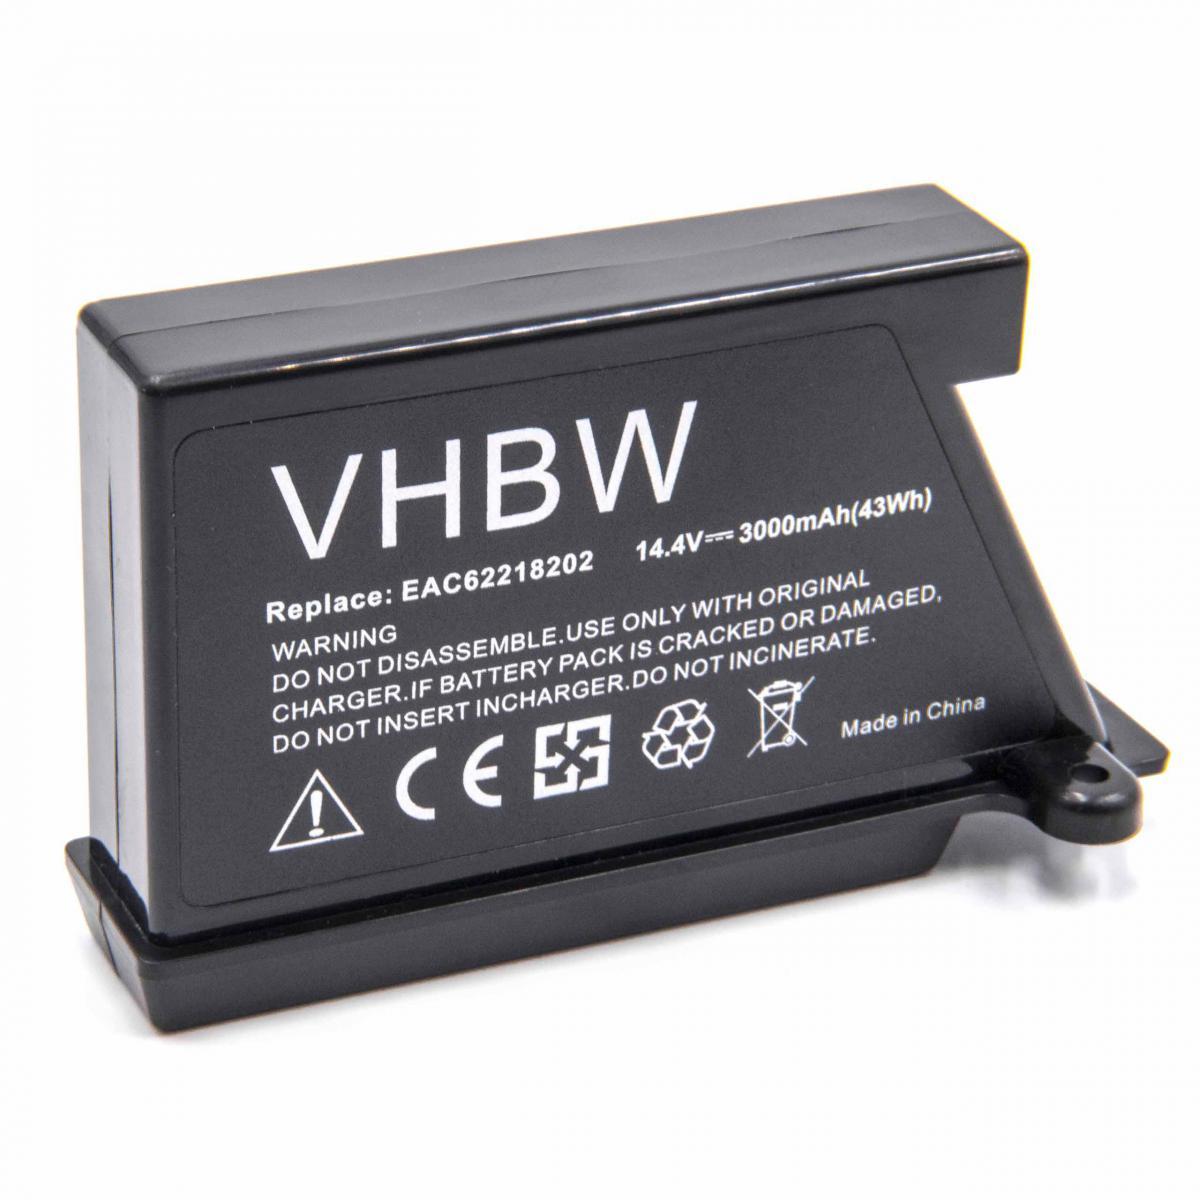 Vhbw vhbw Batterie compatible avec LG HOM-BOT VR6560LV, VR65704LVM, VR6570LVM robot électroménager (3000mAh, 14,4V, Li-ion)